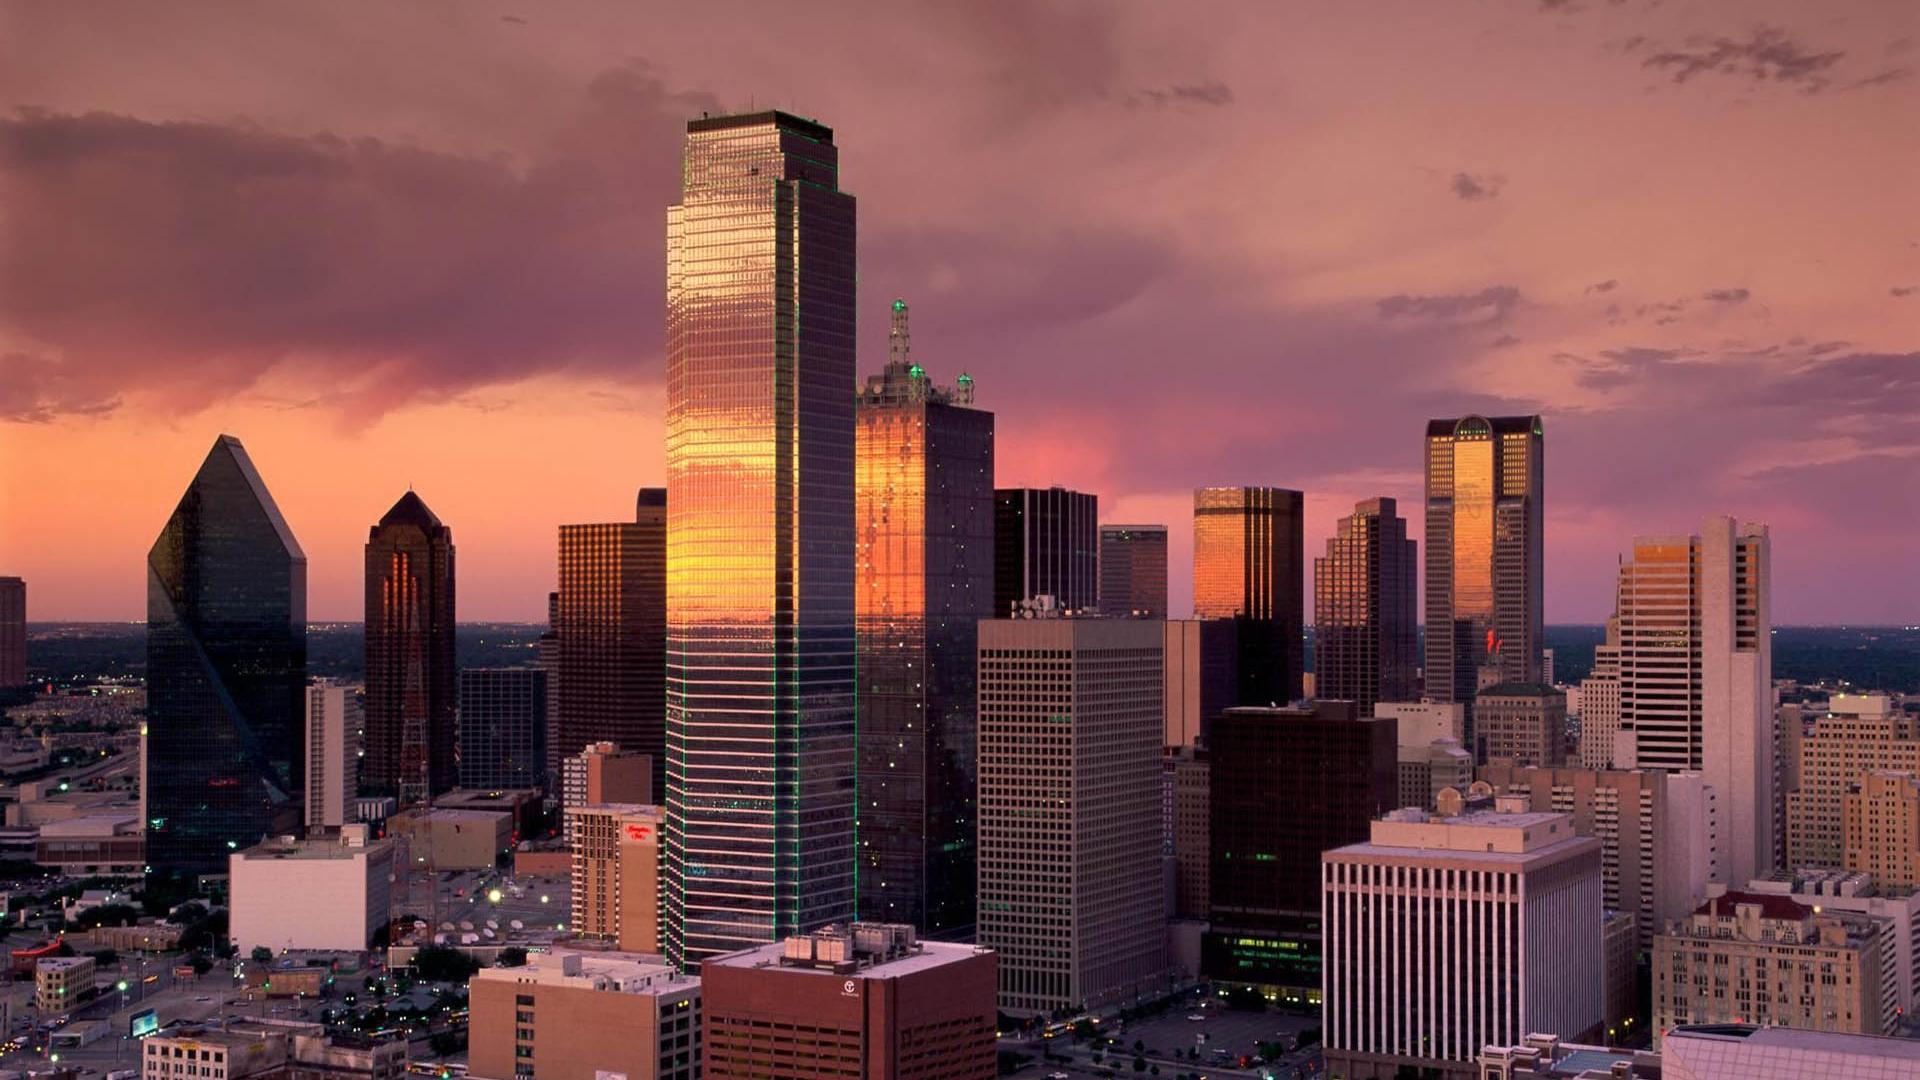 Texas City Skyscraper Building 1920x1080